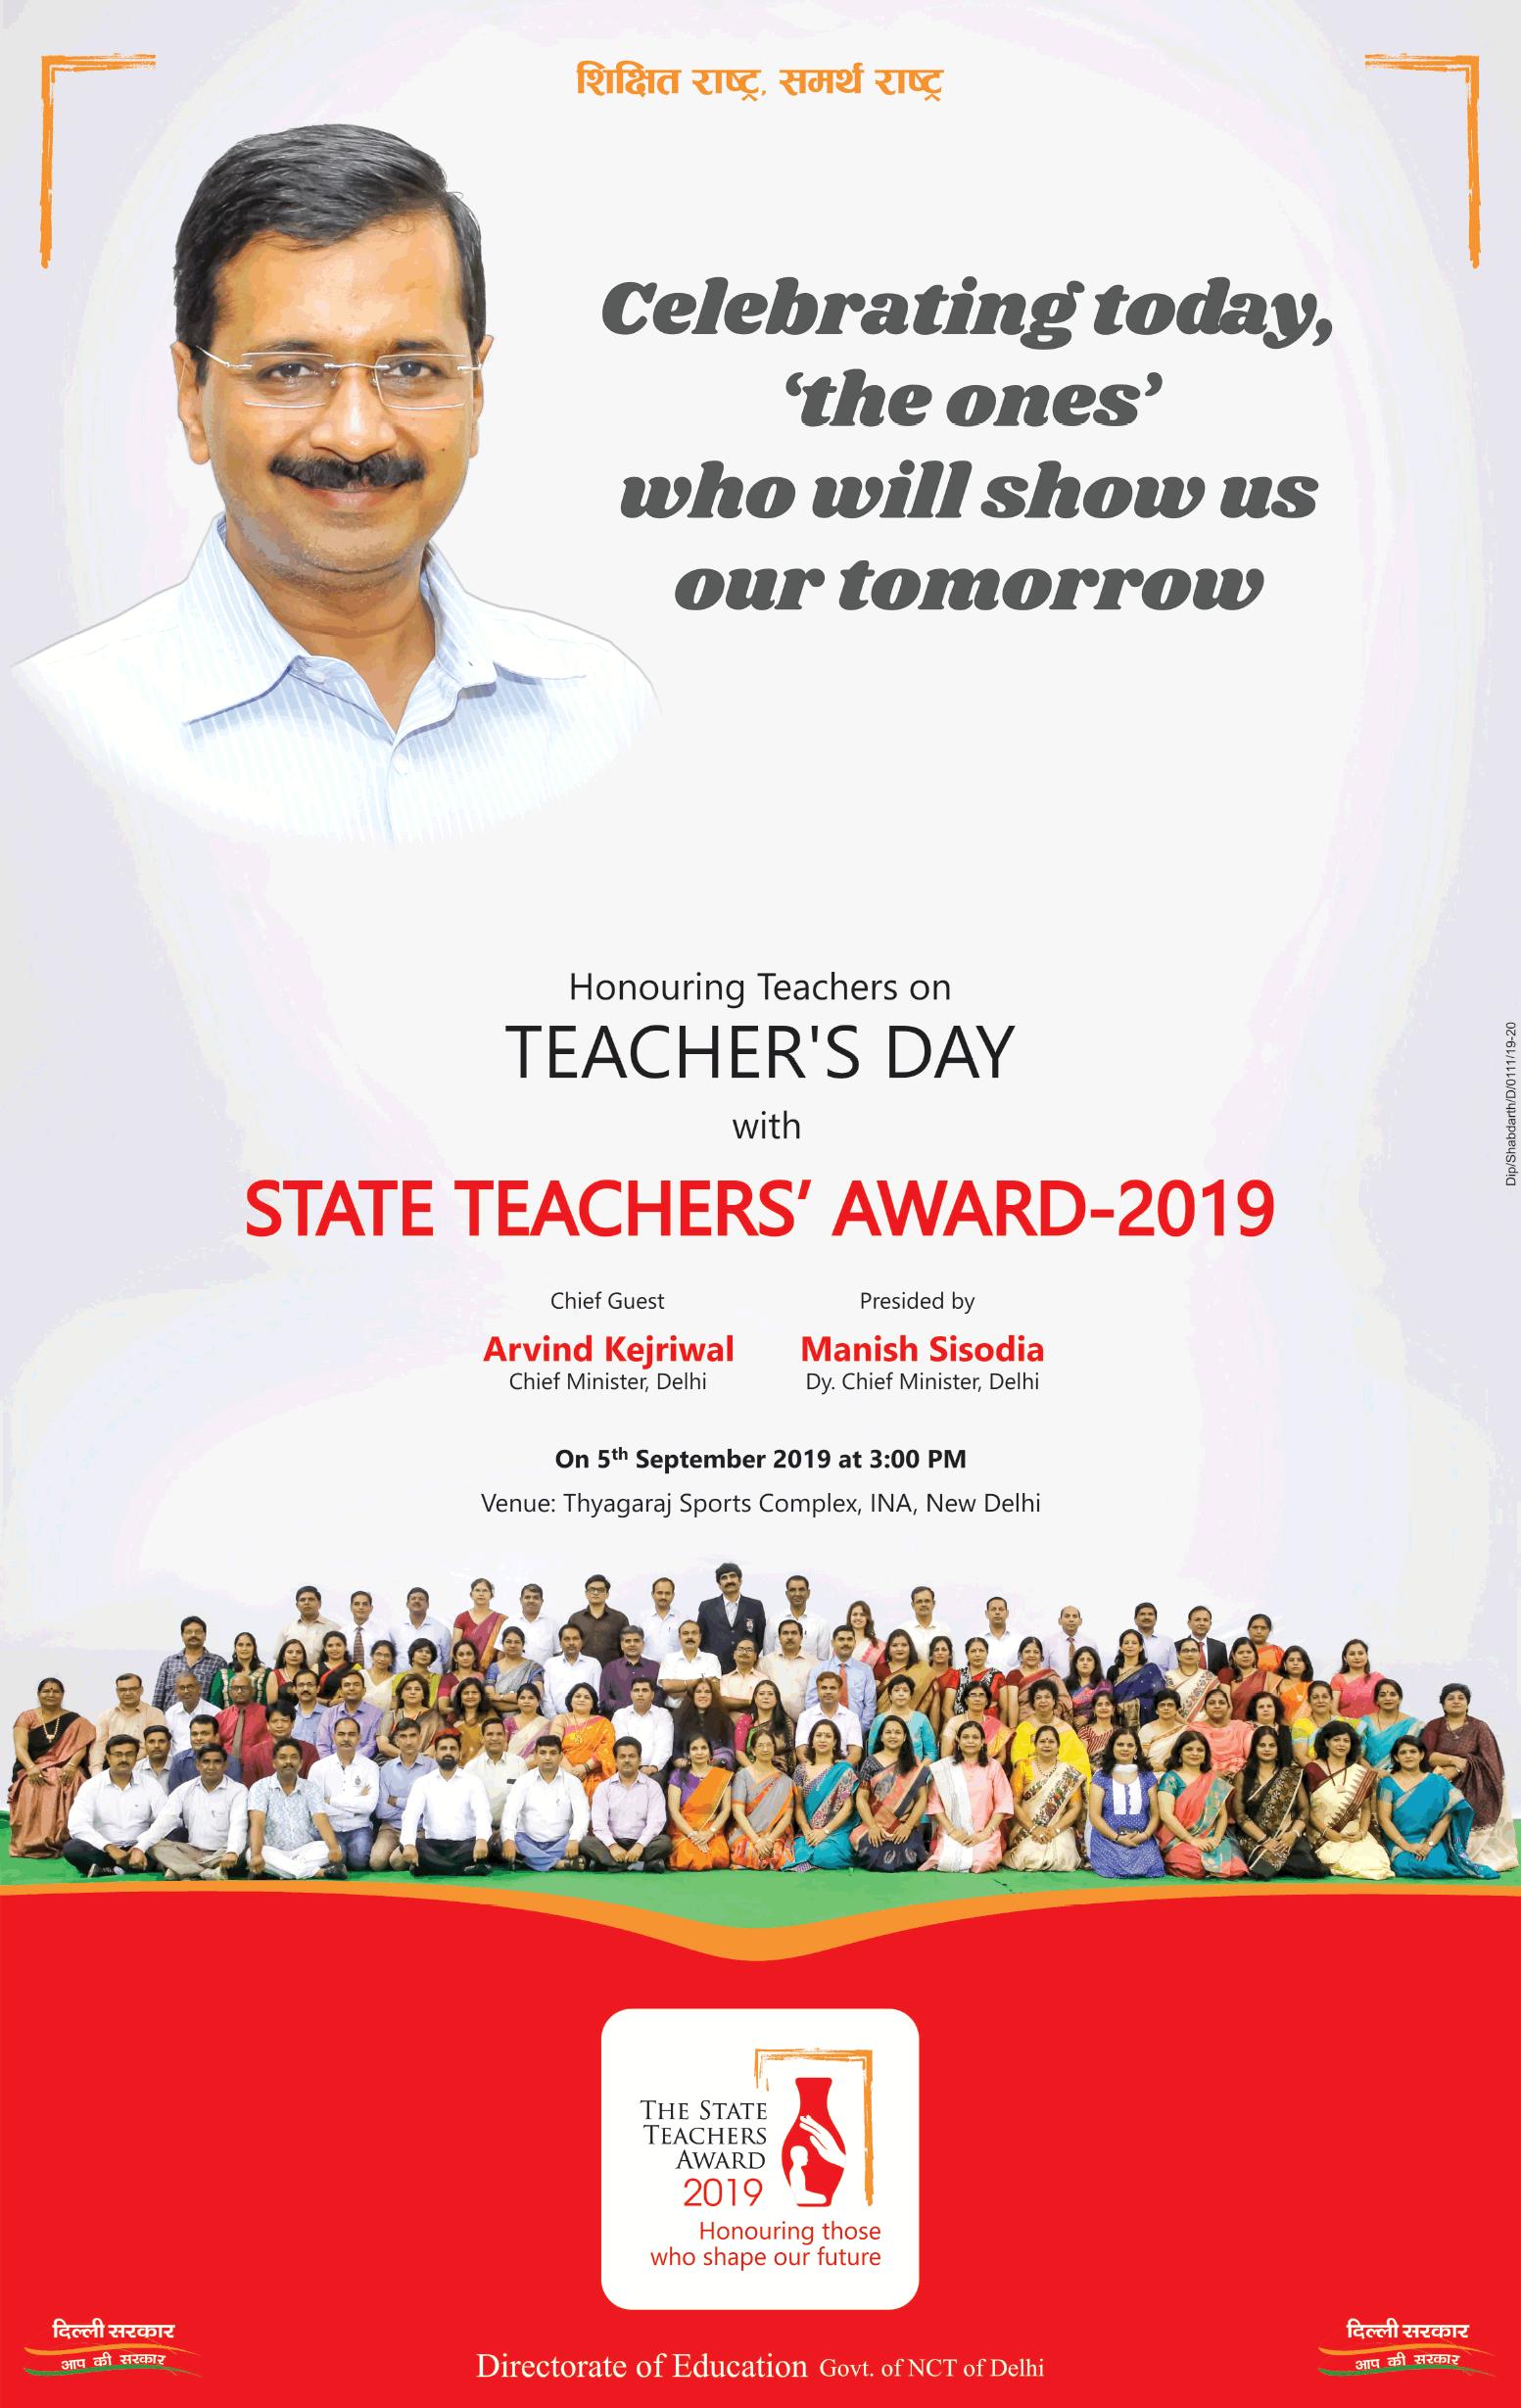 the-state-teachers-award-2019-delhi-ad-times-of-india-delhi-05-09-2019.png